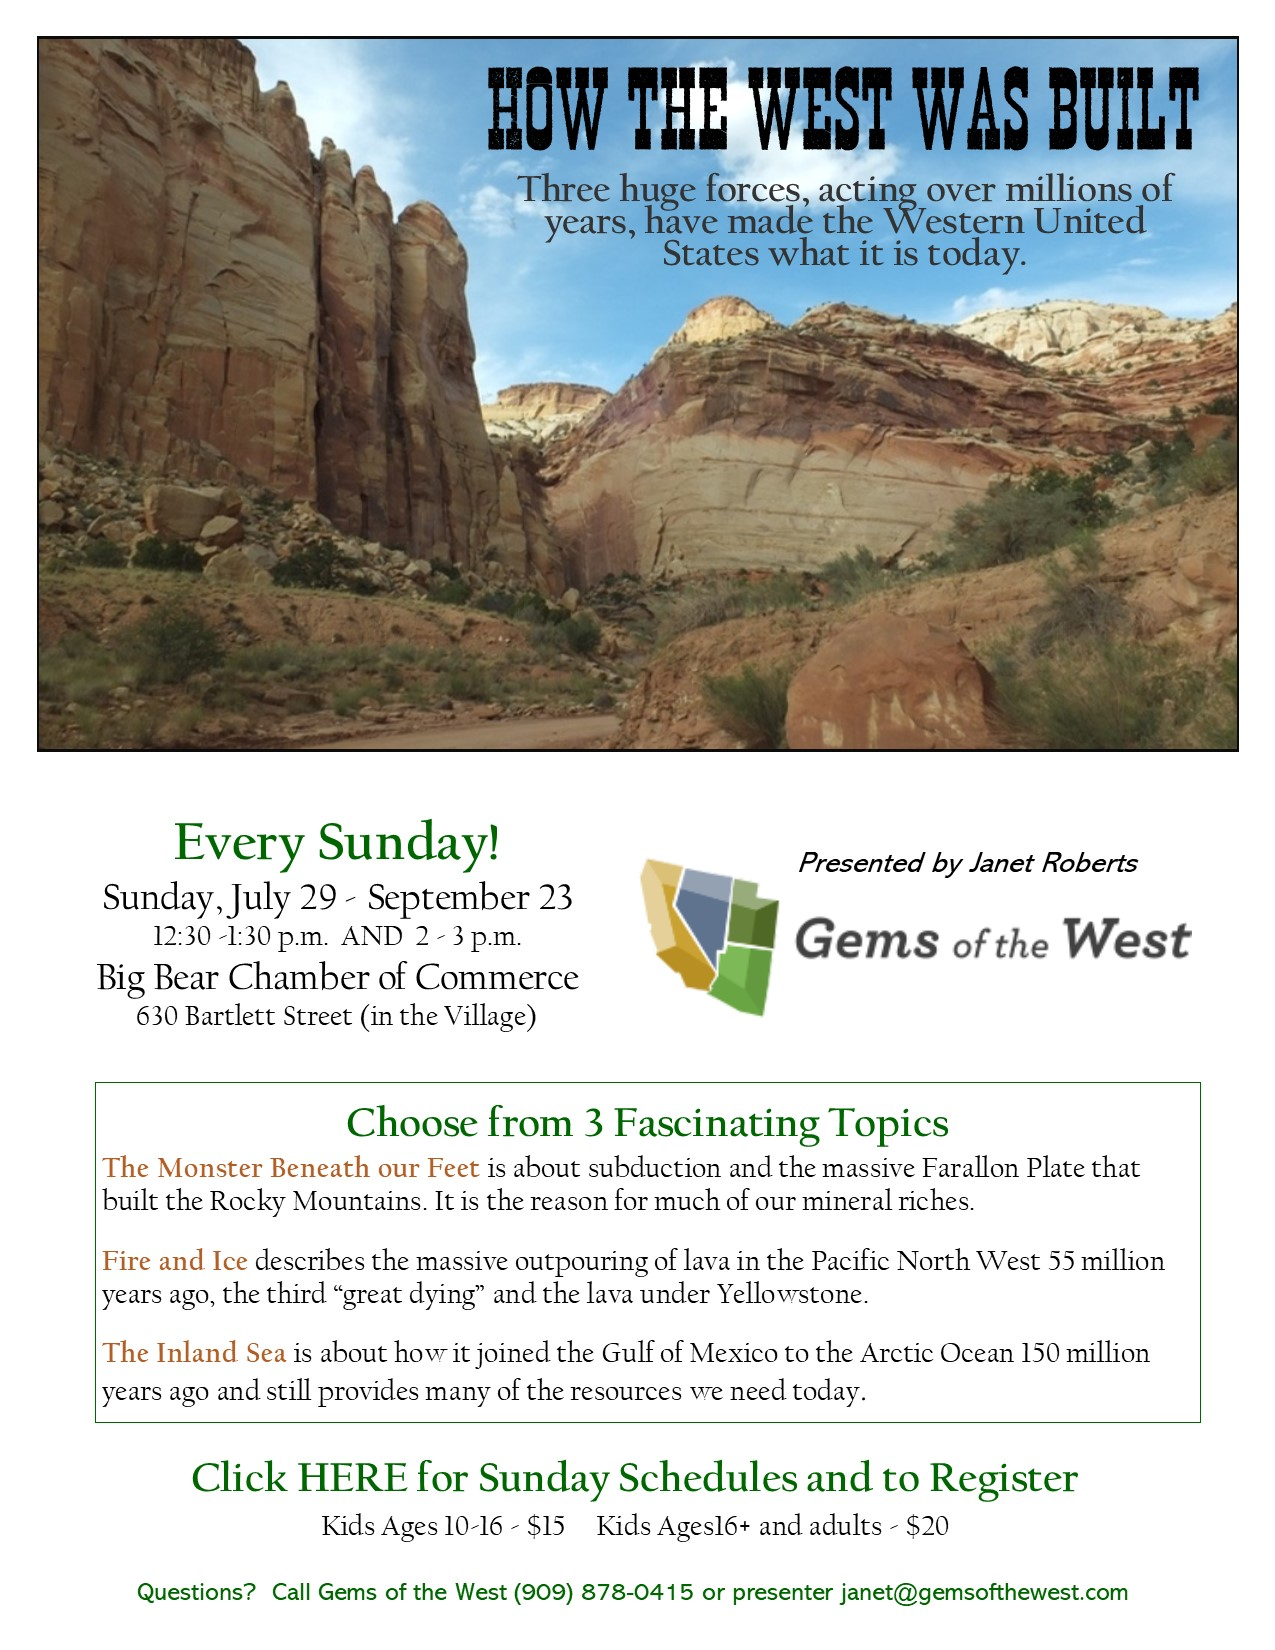 Gems-of-the-West-Seminars-Flyer.jpg